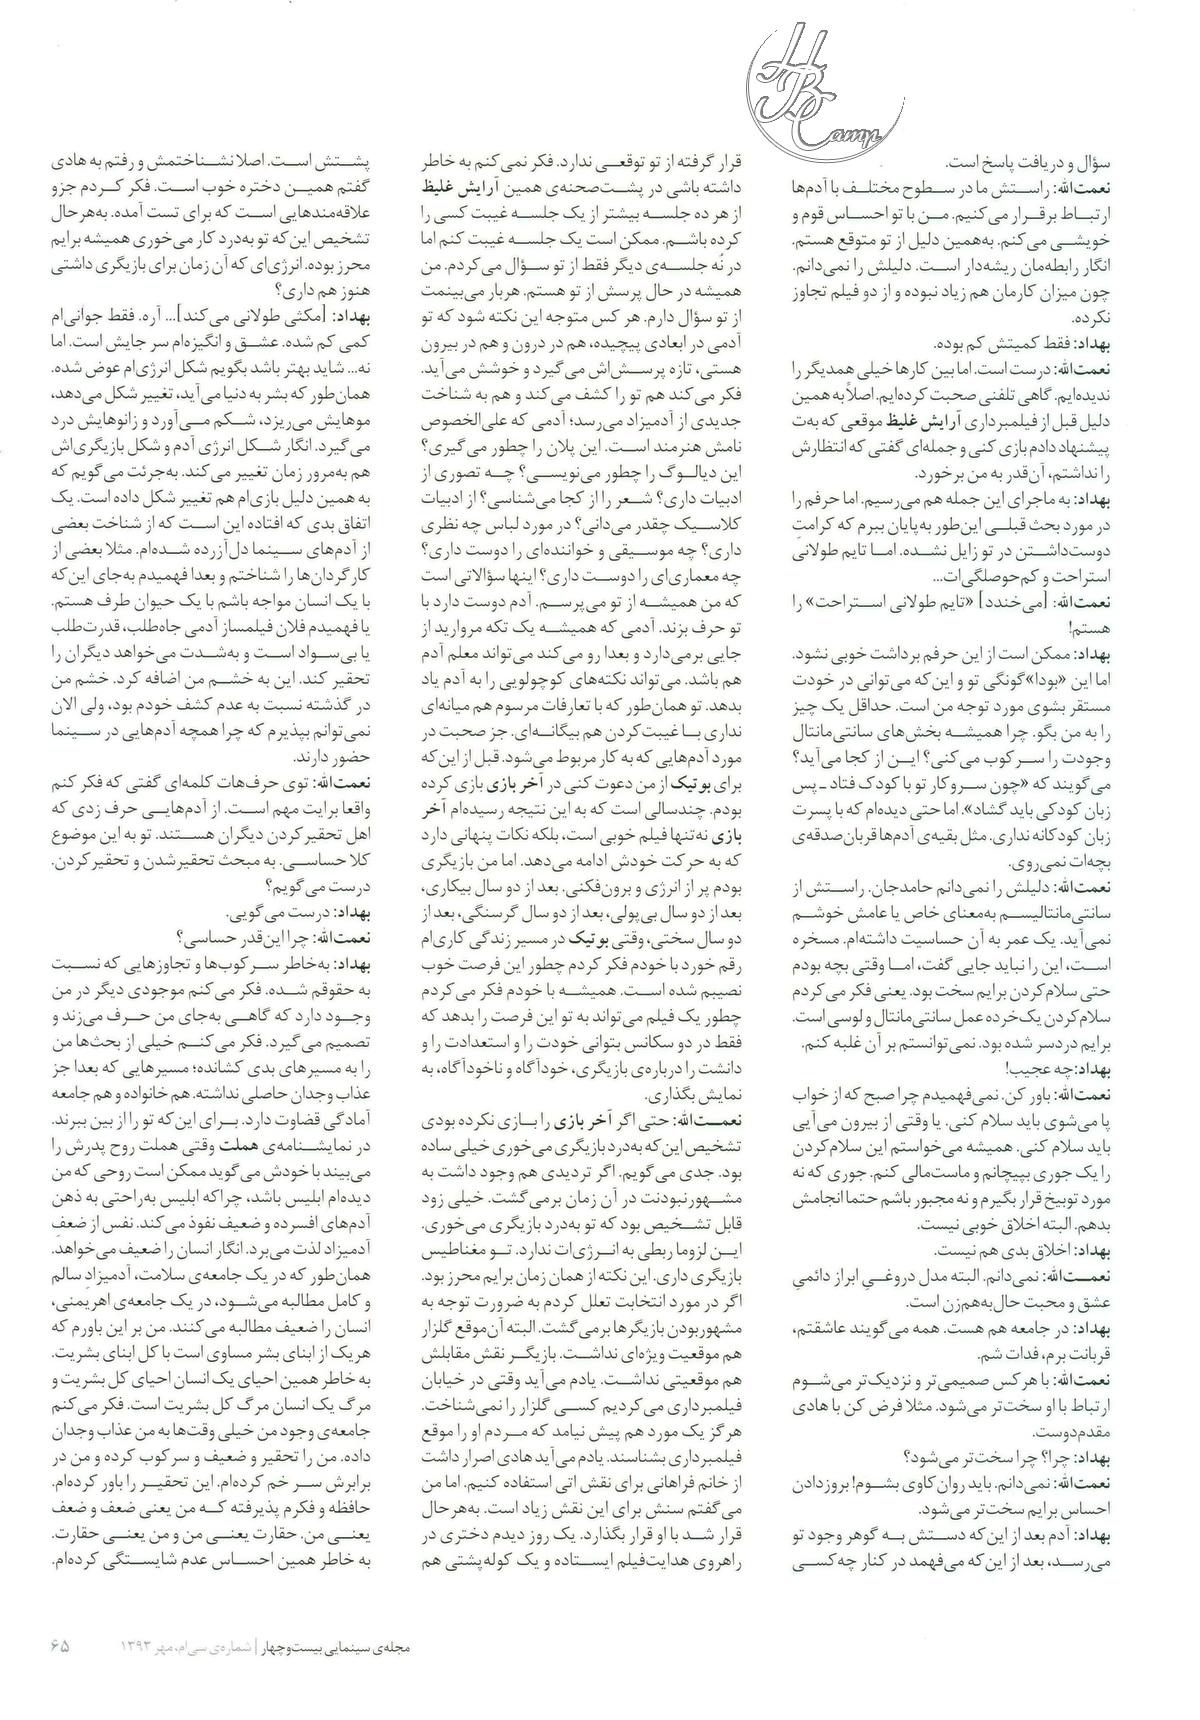 http://yotab.persiangig.com/magazin/24mag-56/02.jpg